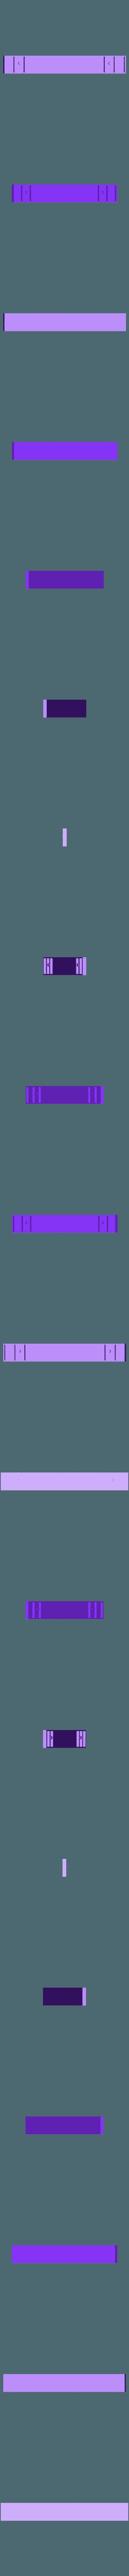 GEFU_knife_holder_mount.stl Download free SCAD file GEFU magnetic knife holder mount for double sided tape • 3D printer design, QB89Dragon